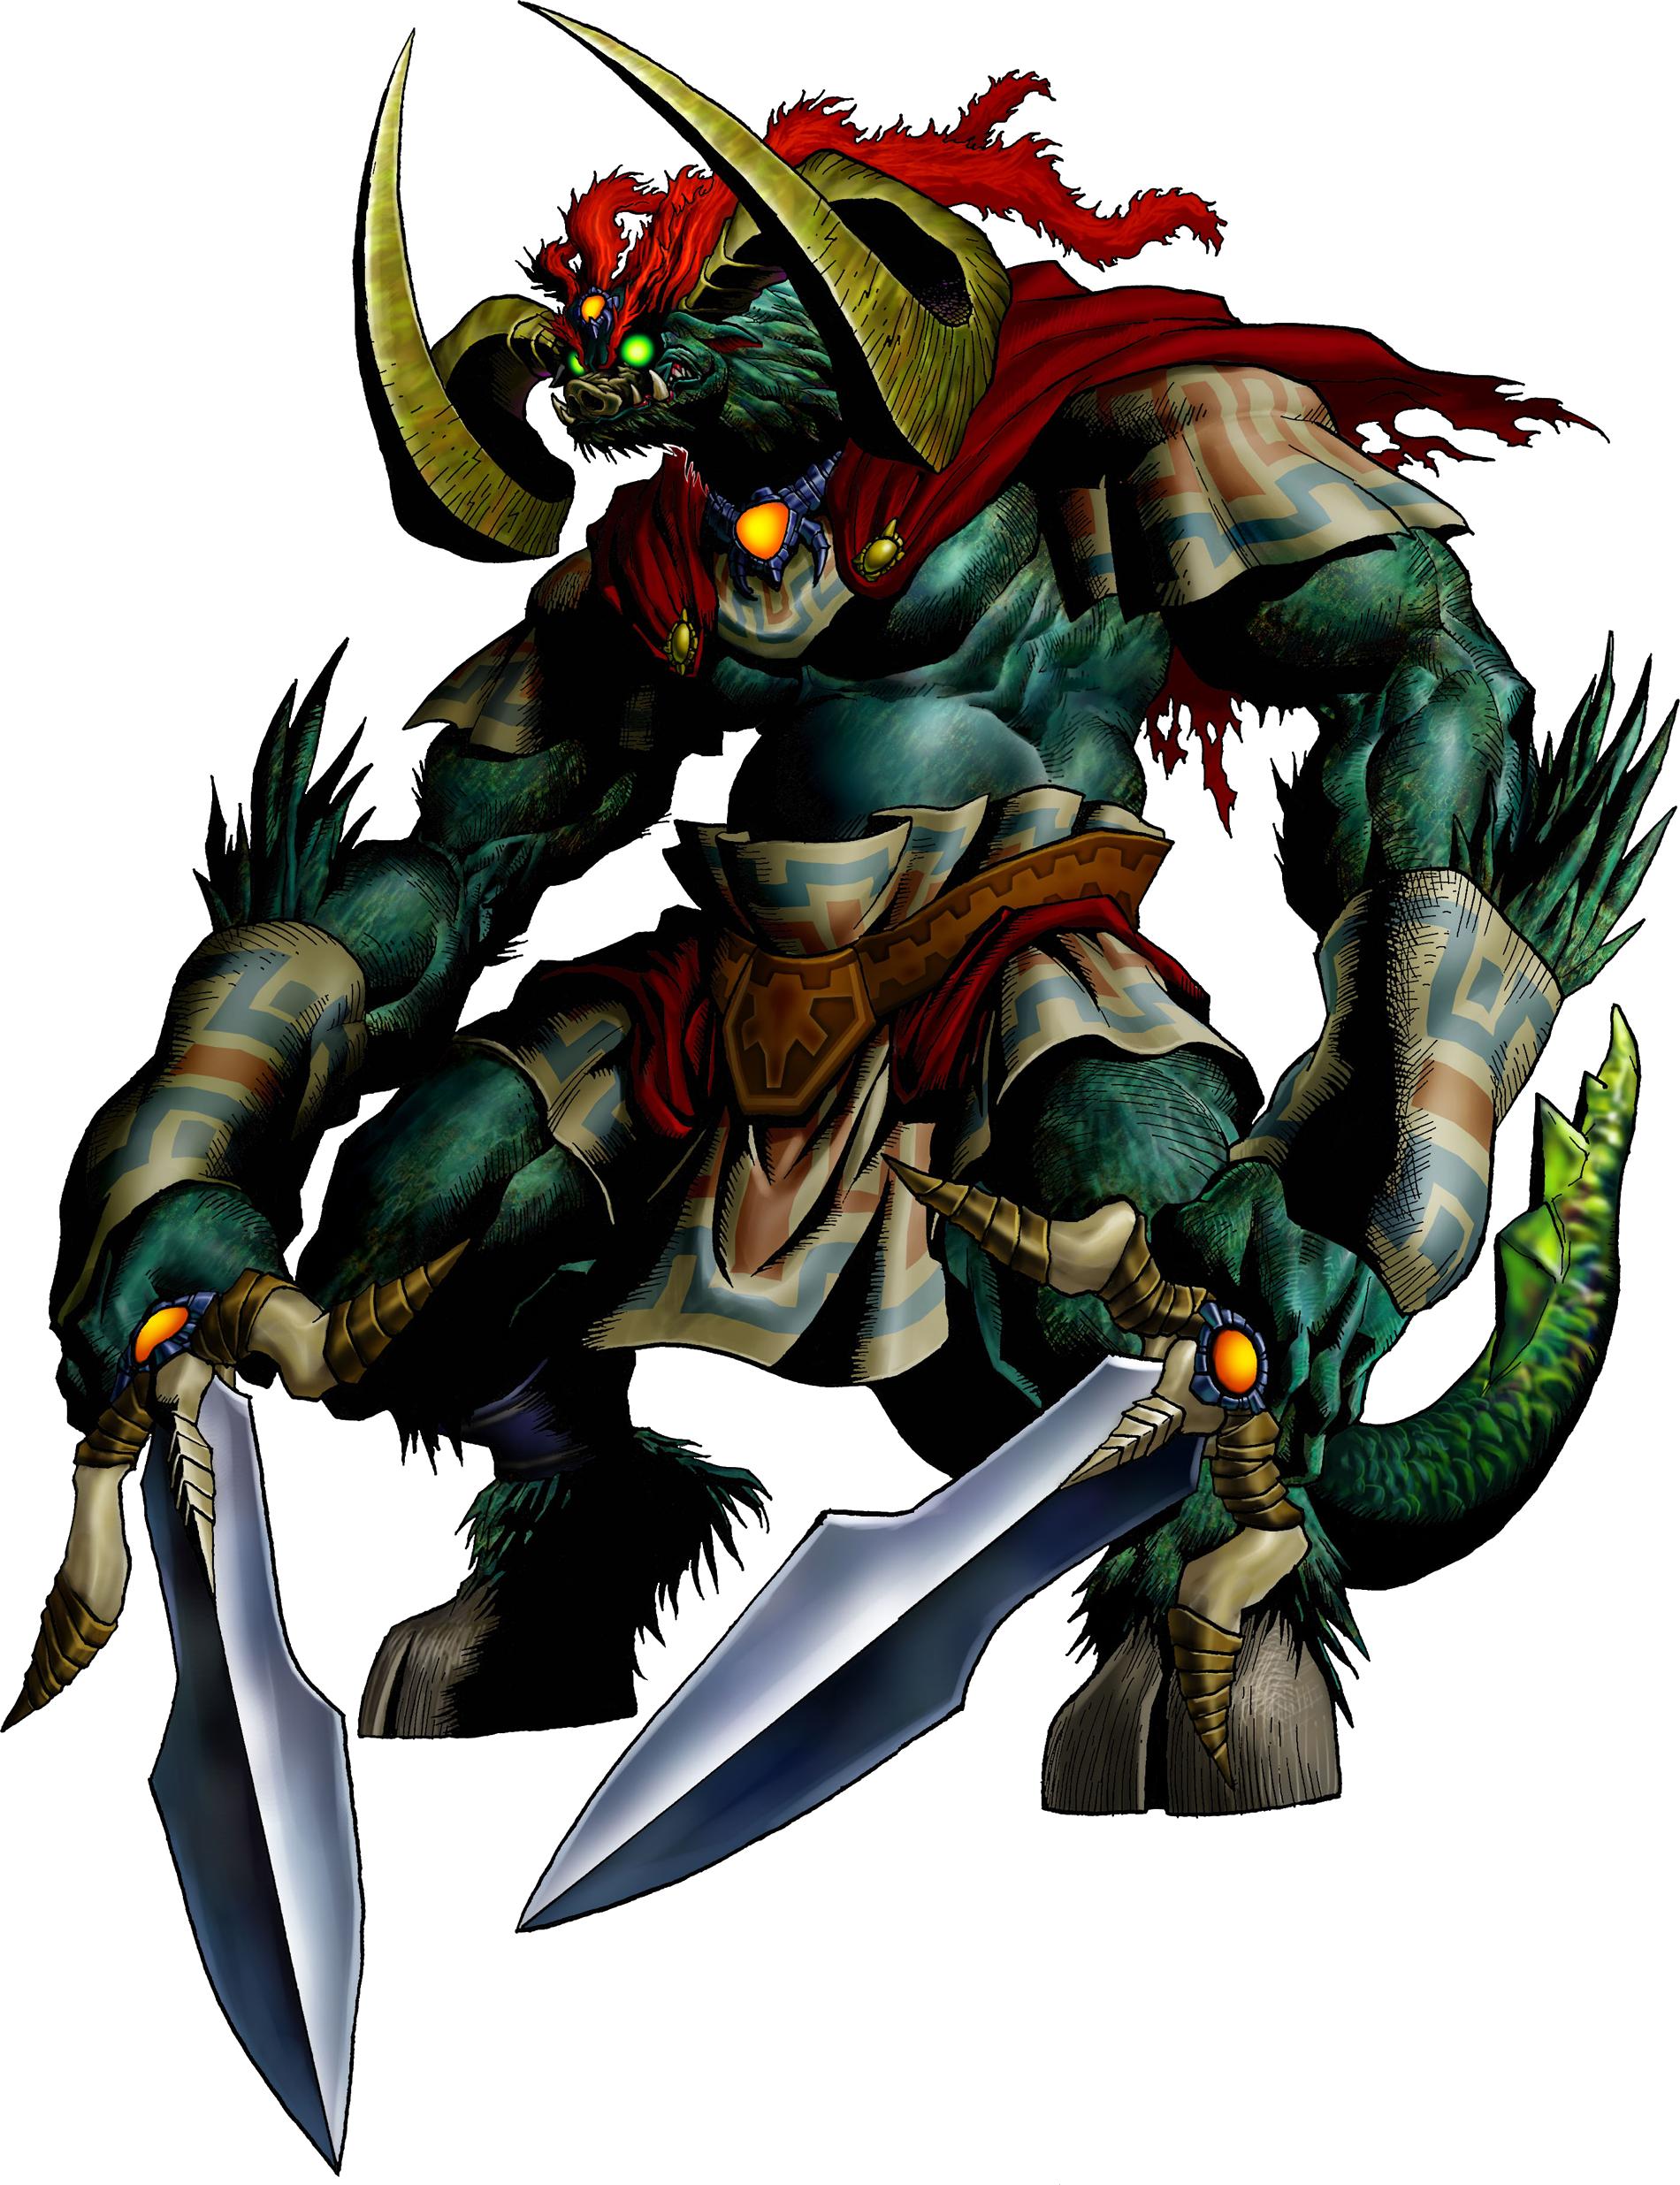 Ganon Ocarina Of Time Zeldapedia Fandom